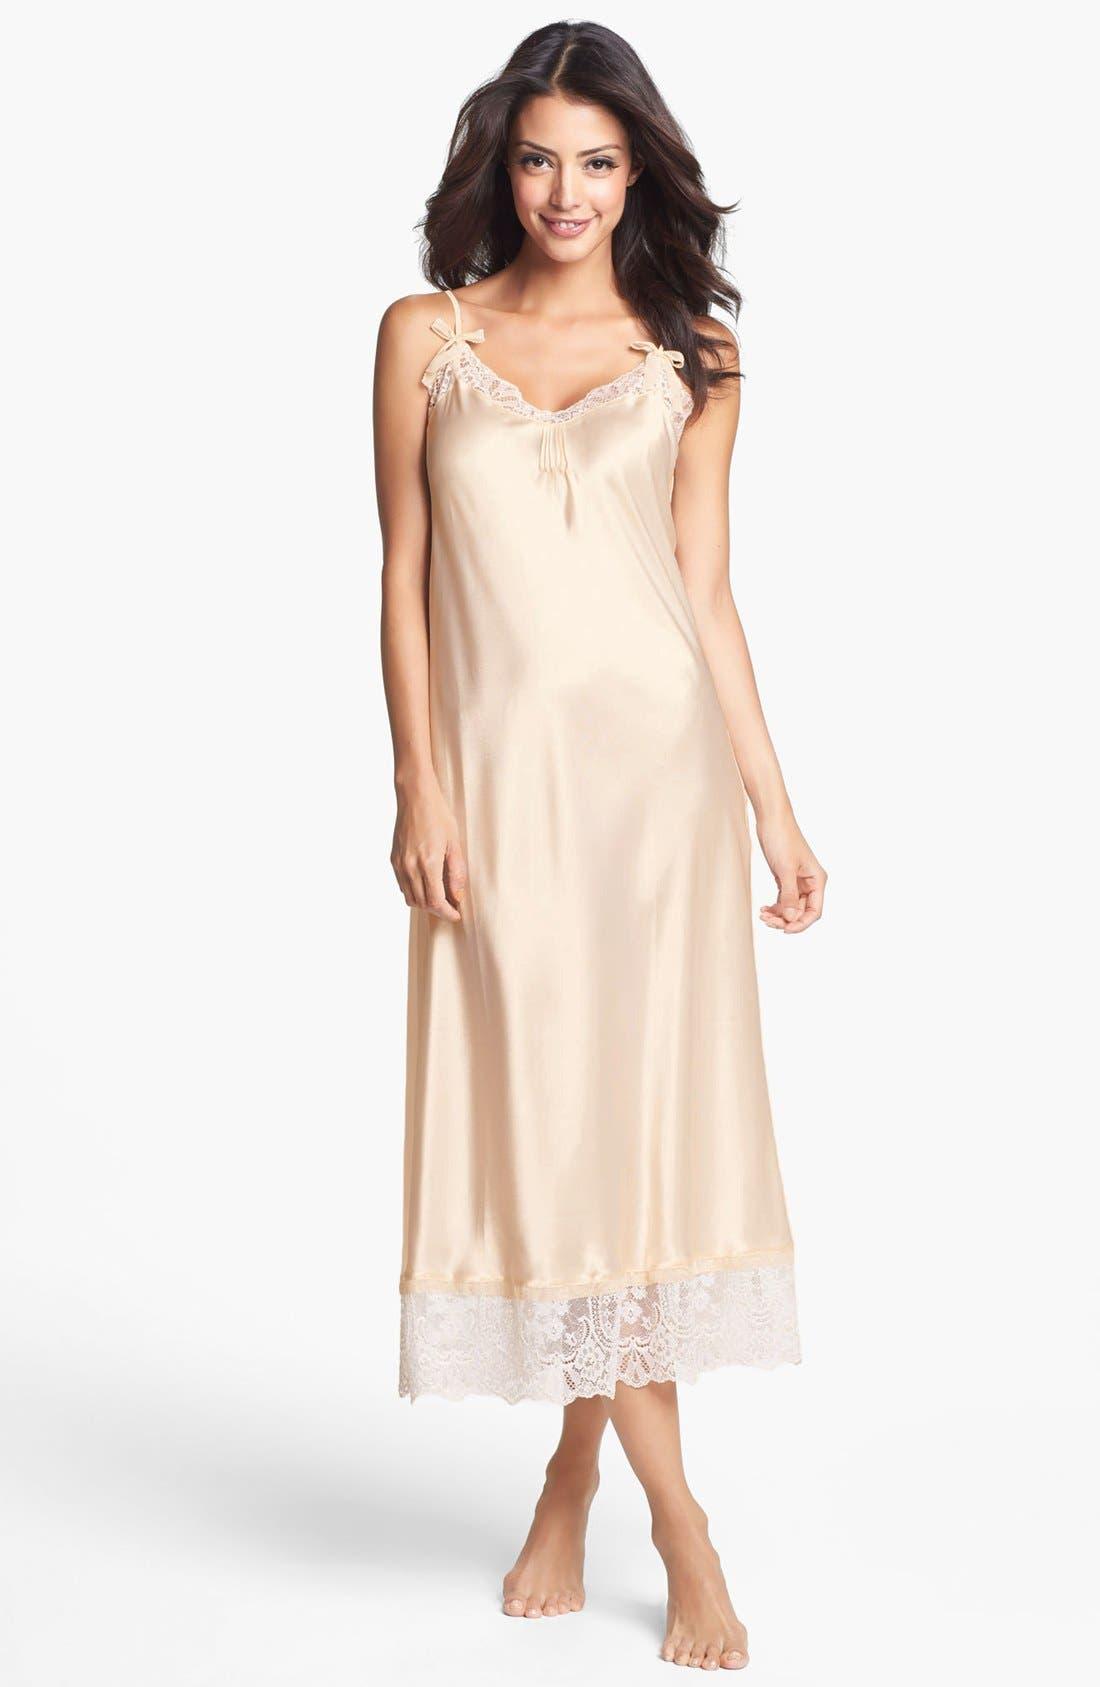 Alternate Image 1 Selected - Oscar de la Renta Sleepwear 'Timeless Romance' Nightgown